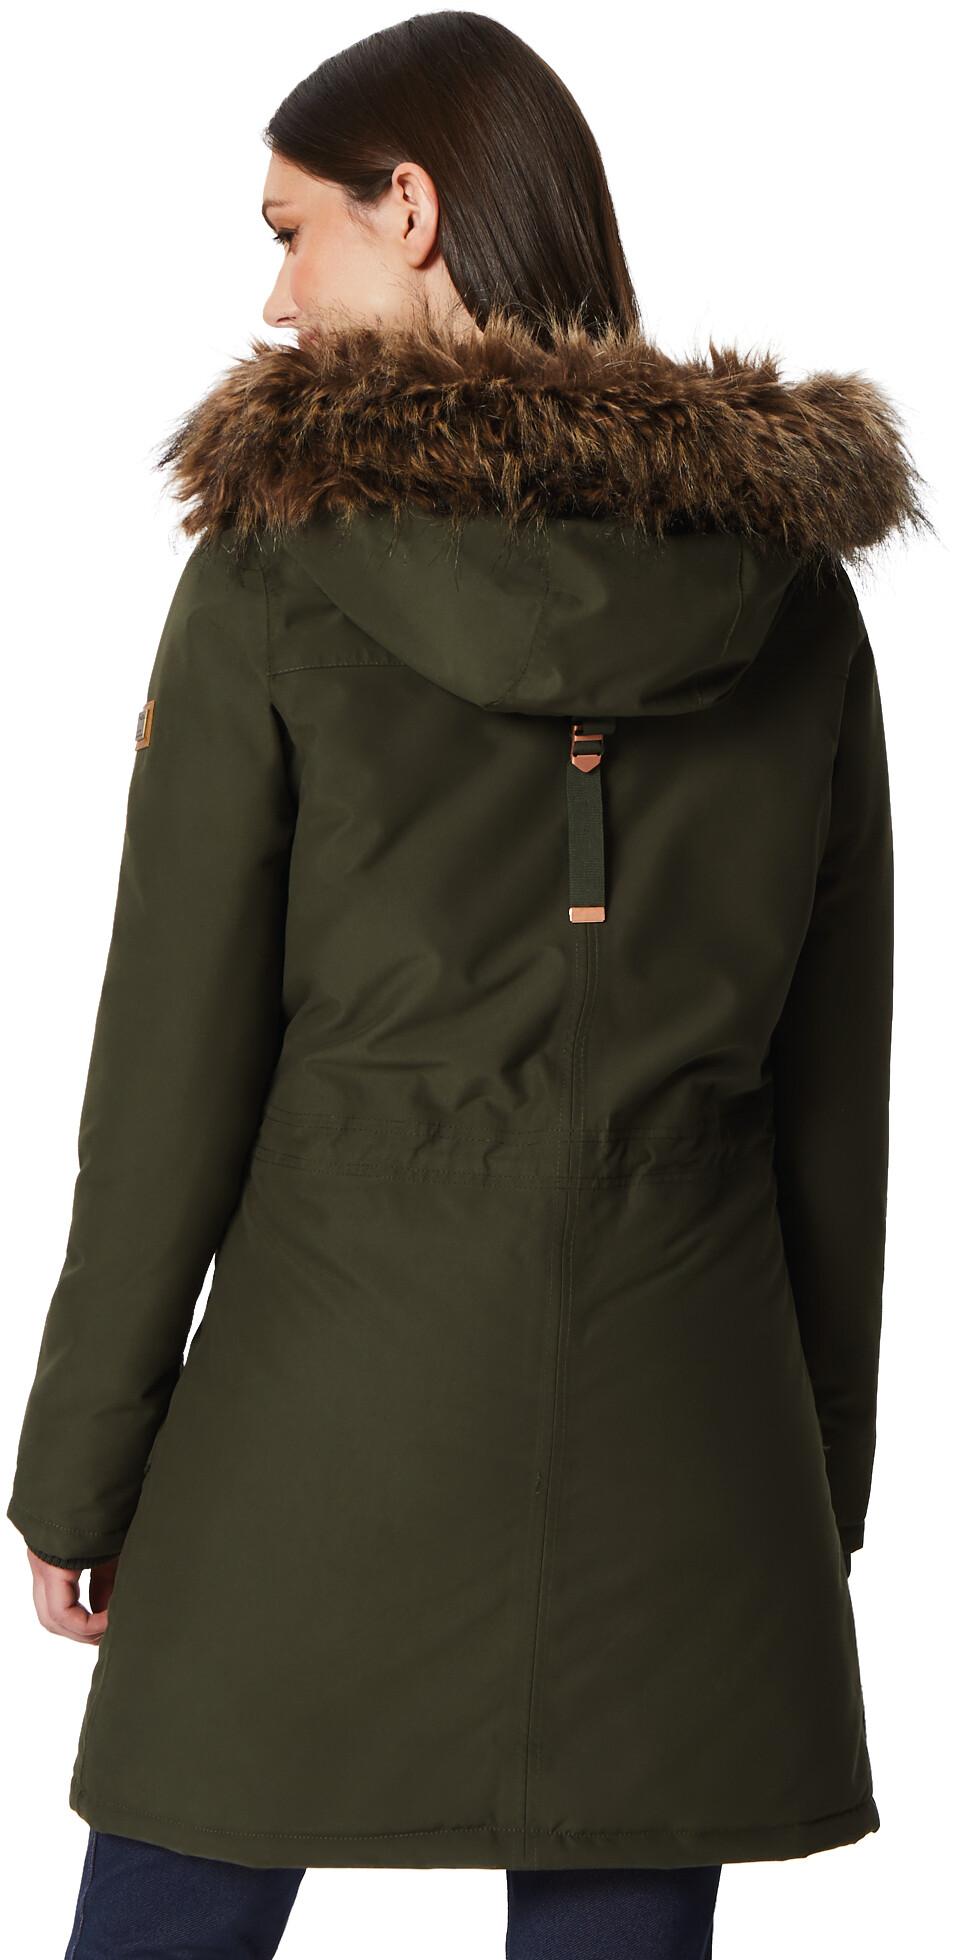 466ee2c2b Regatta Saffira Jacket Women dark khaki